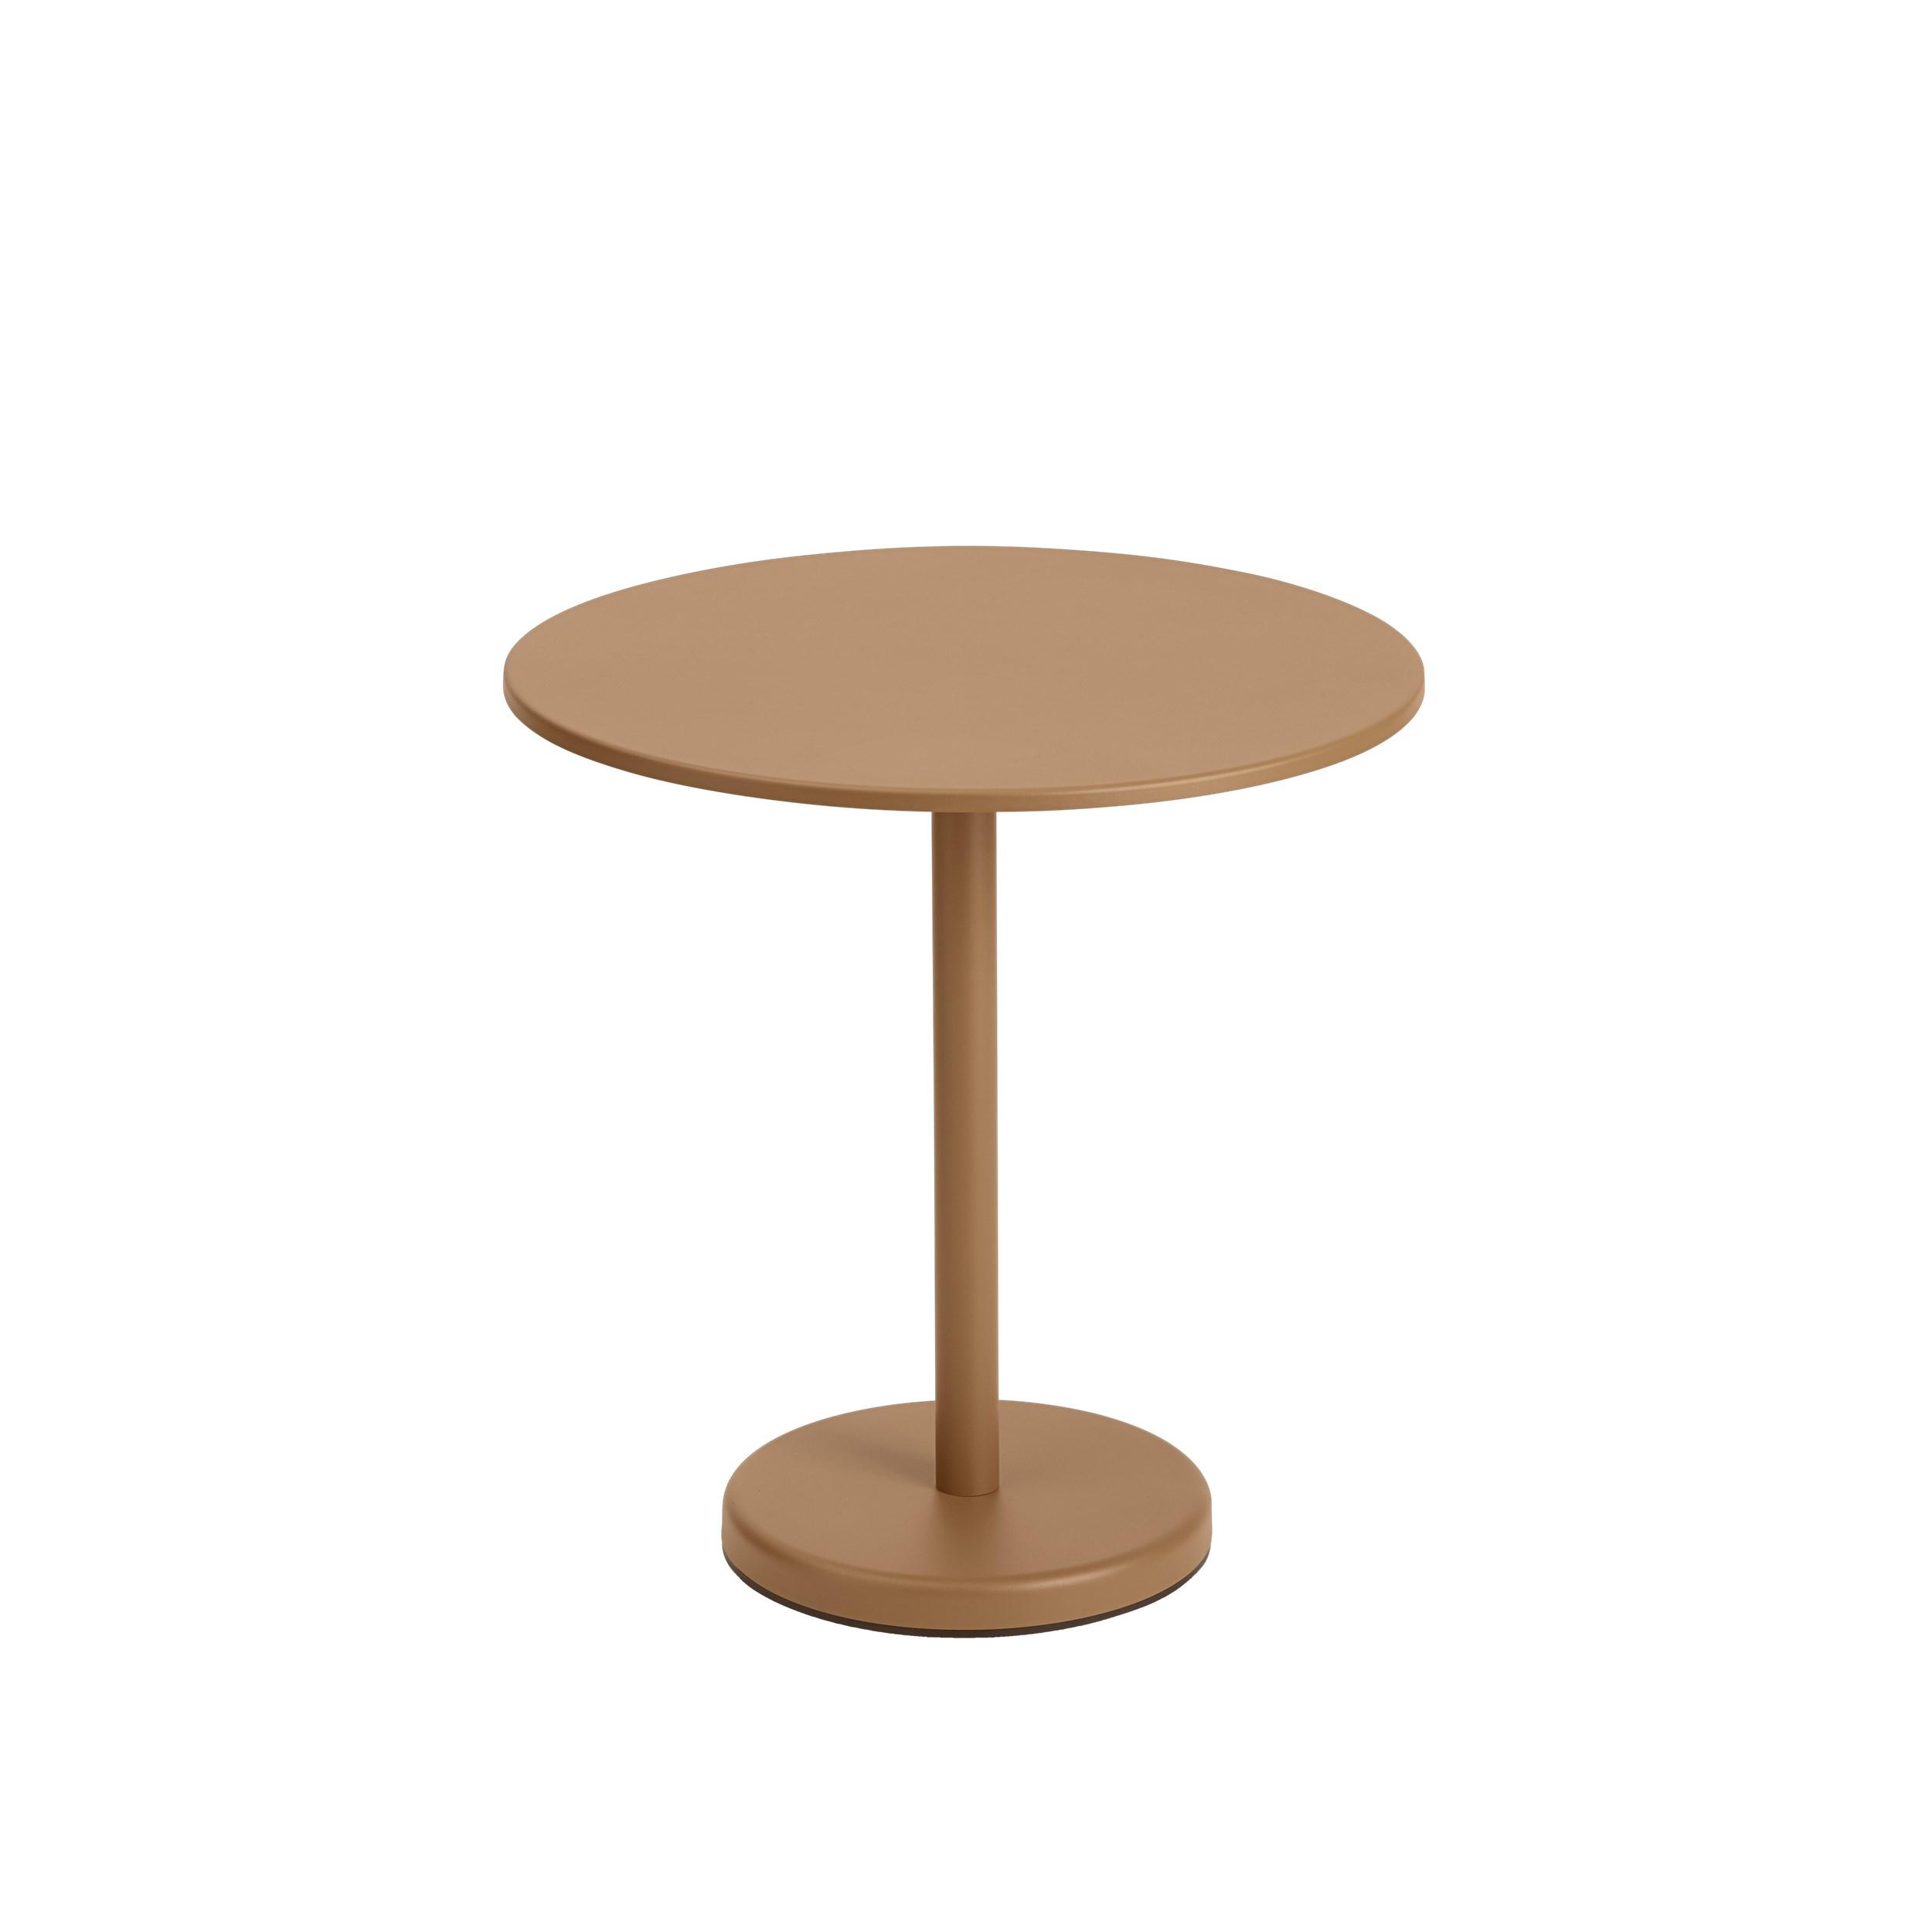 Linear Steel Cafe Table 70cm Diameter.